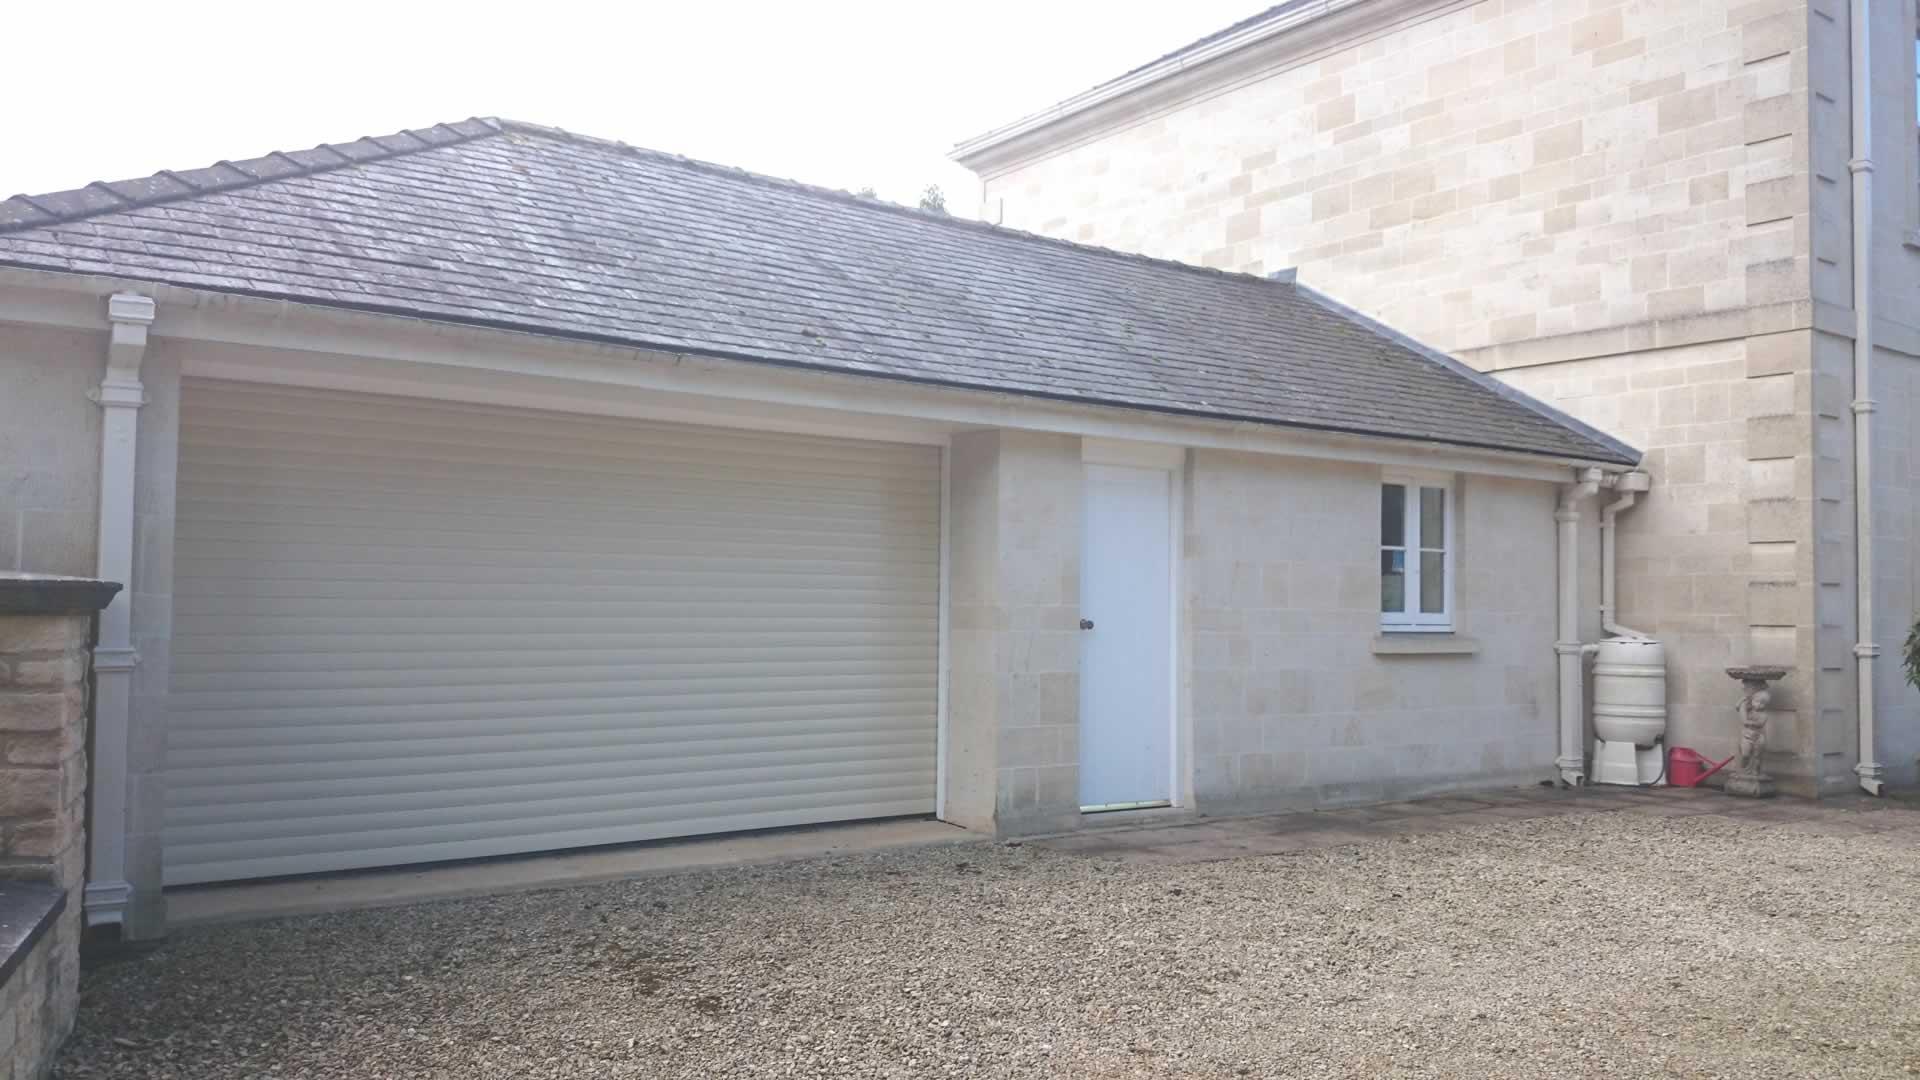 1080 #536178 Roller Garage Doors Progressive Systems (UK) save image Garage Doors Systems 35871920